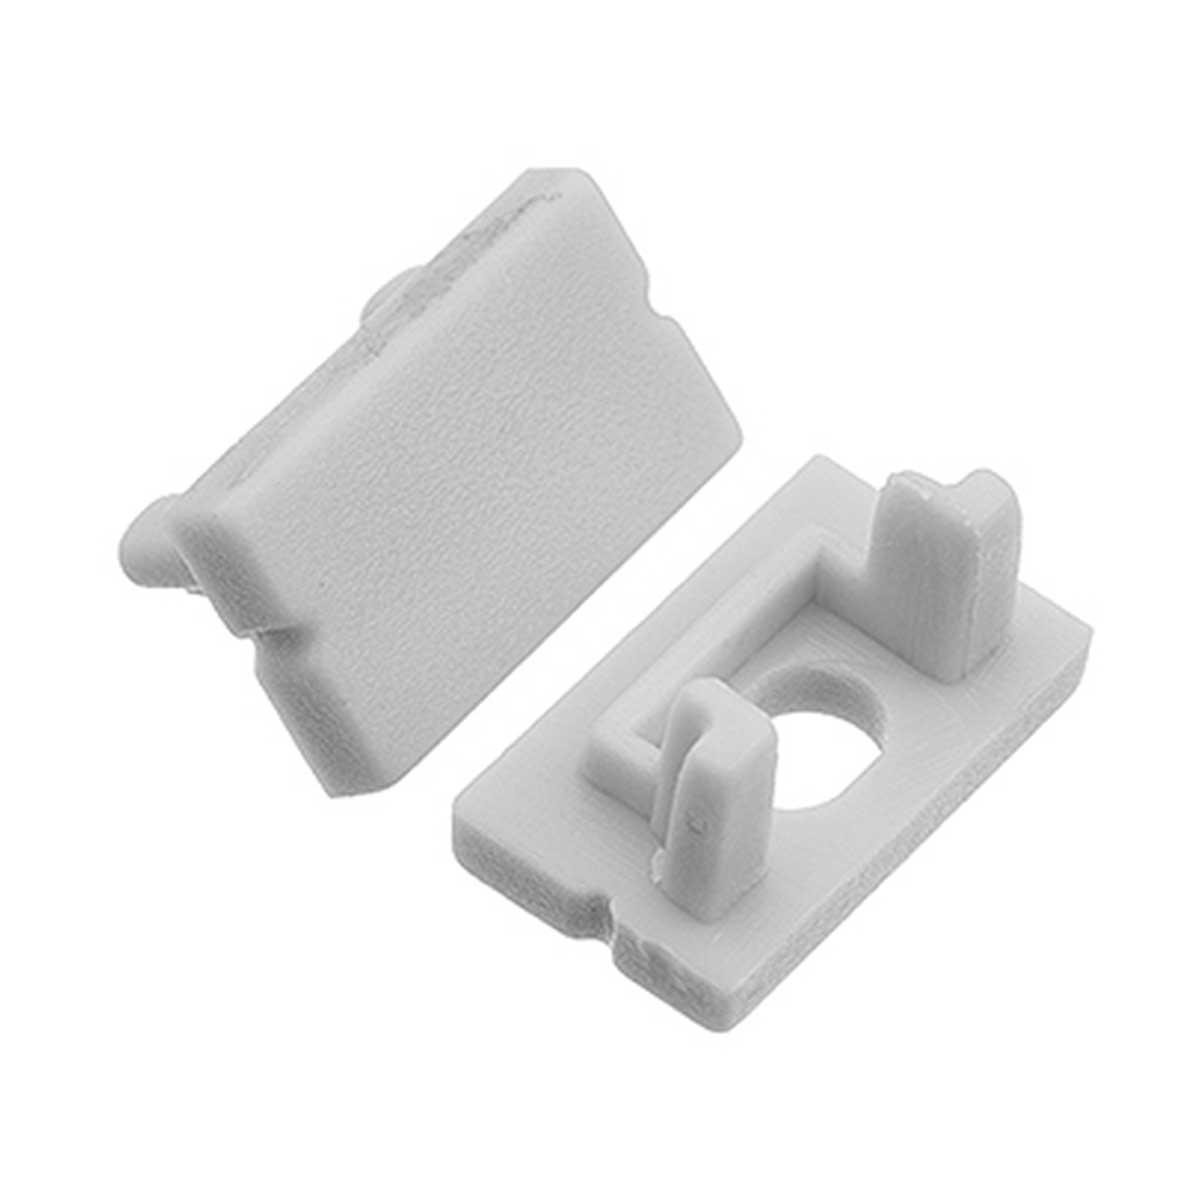 1 Paar Endkappen für Aufbau U-Profil  14 x 7mm (4283)